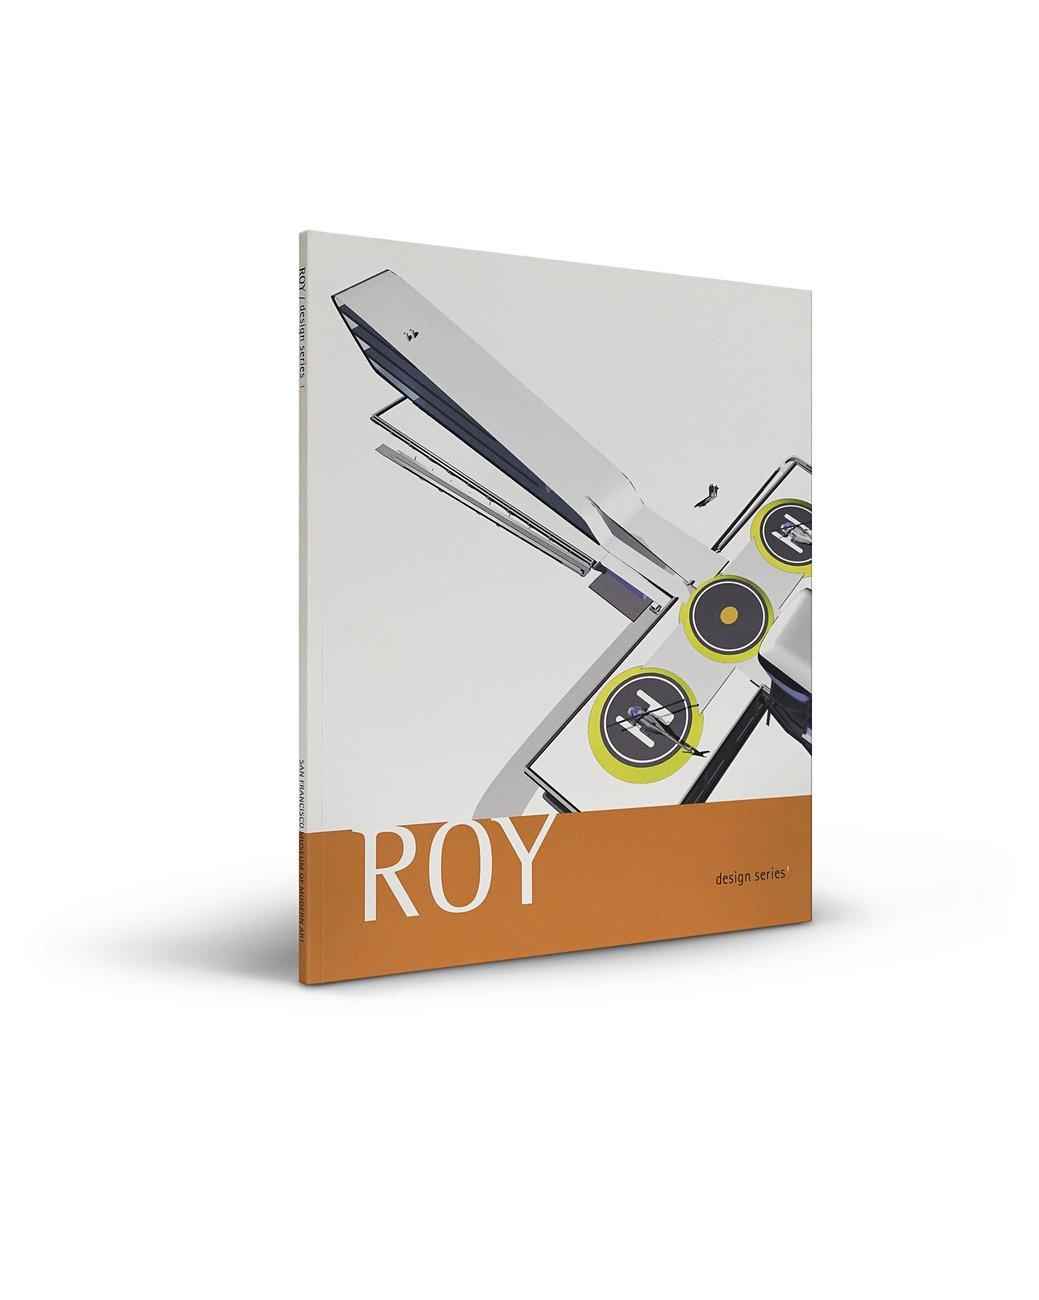 ROY: design series 1 publication cover